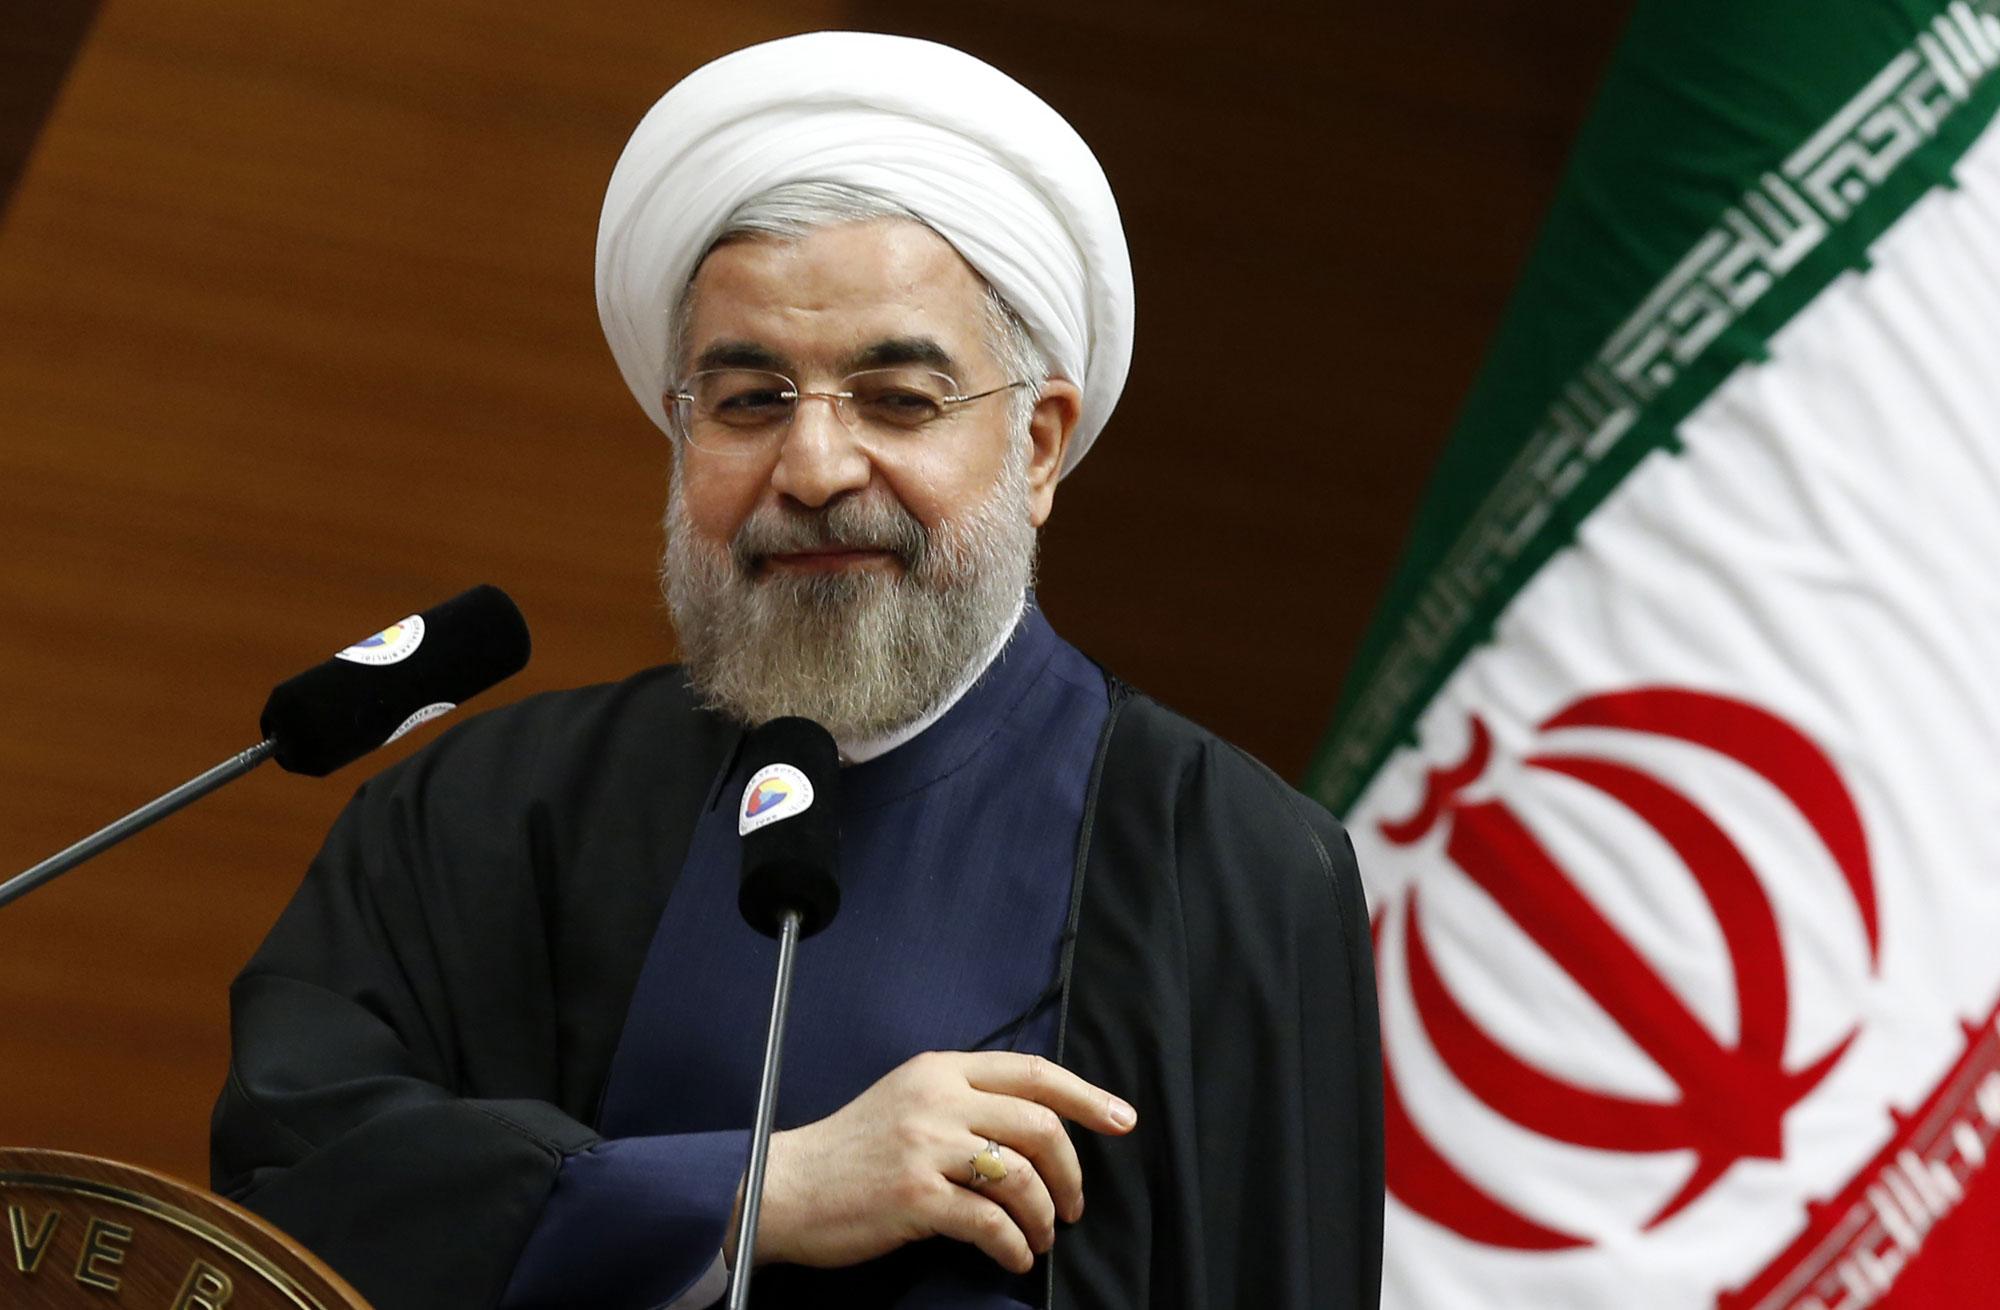 La candidature d'Ahmadinejad à la présidentielle invalidée — Iran